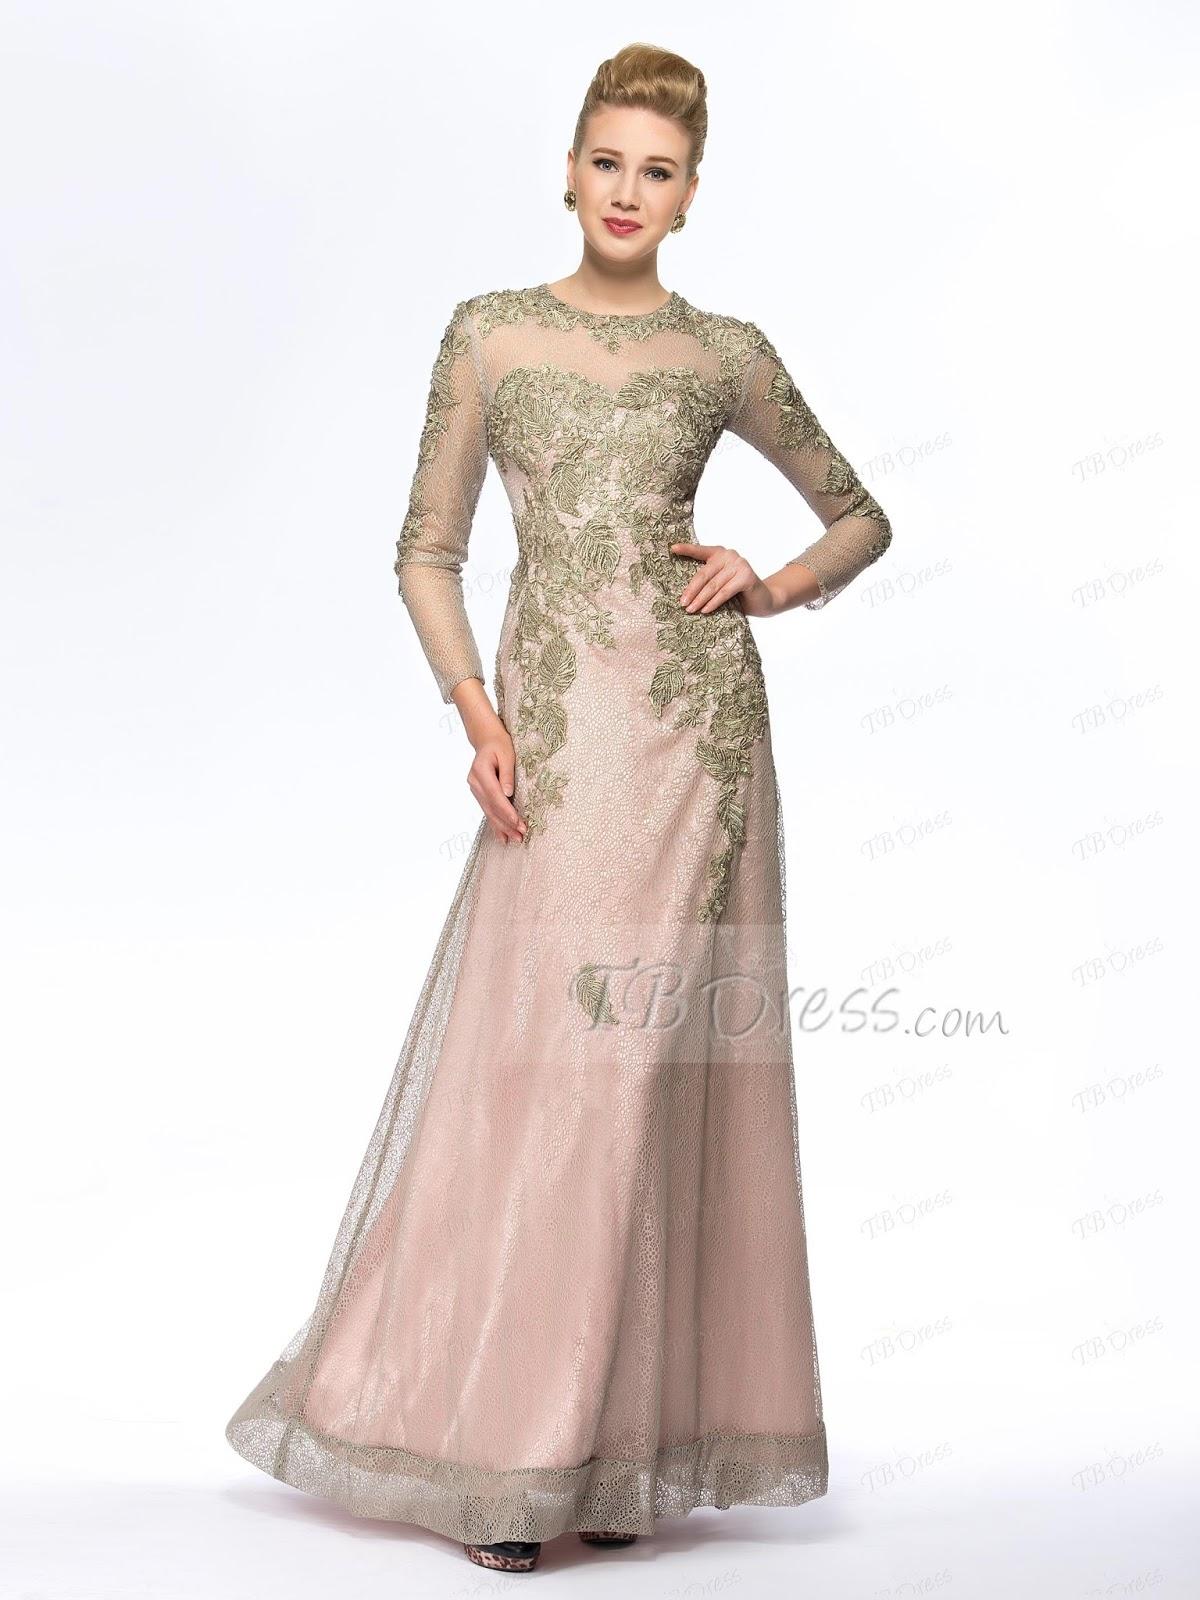 Petite mother of the bride dresses  She Dresses   Fashion ...